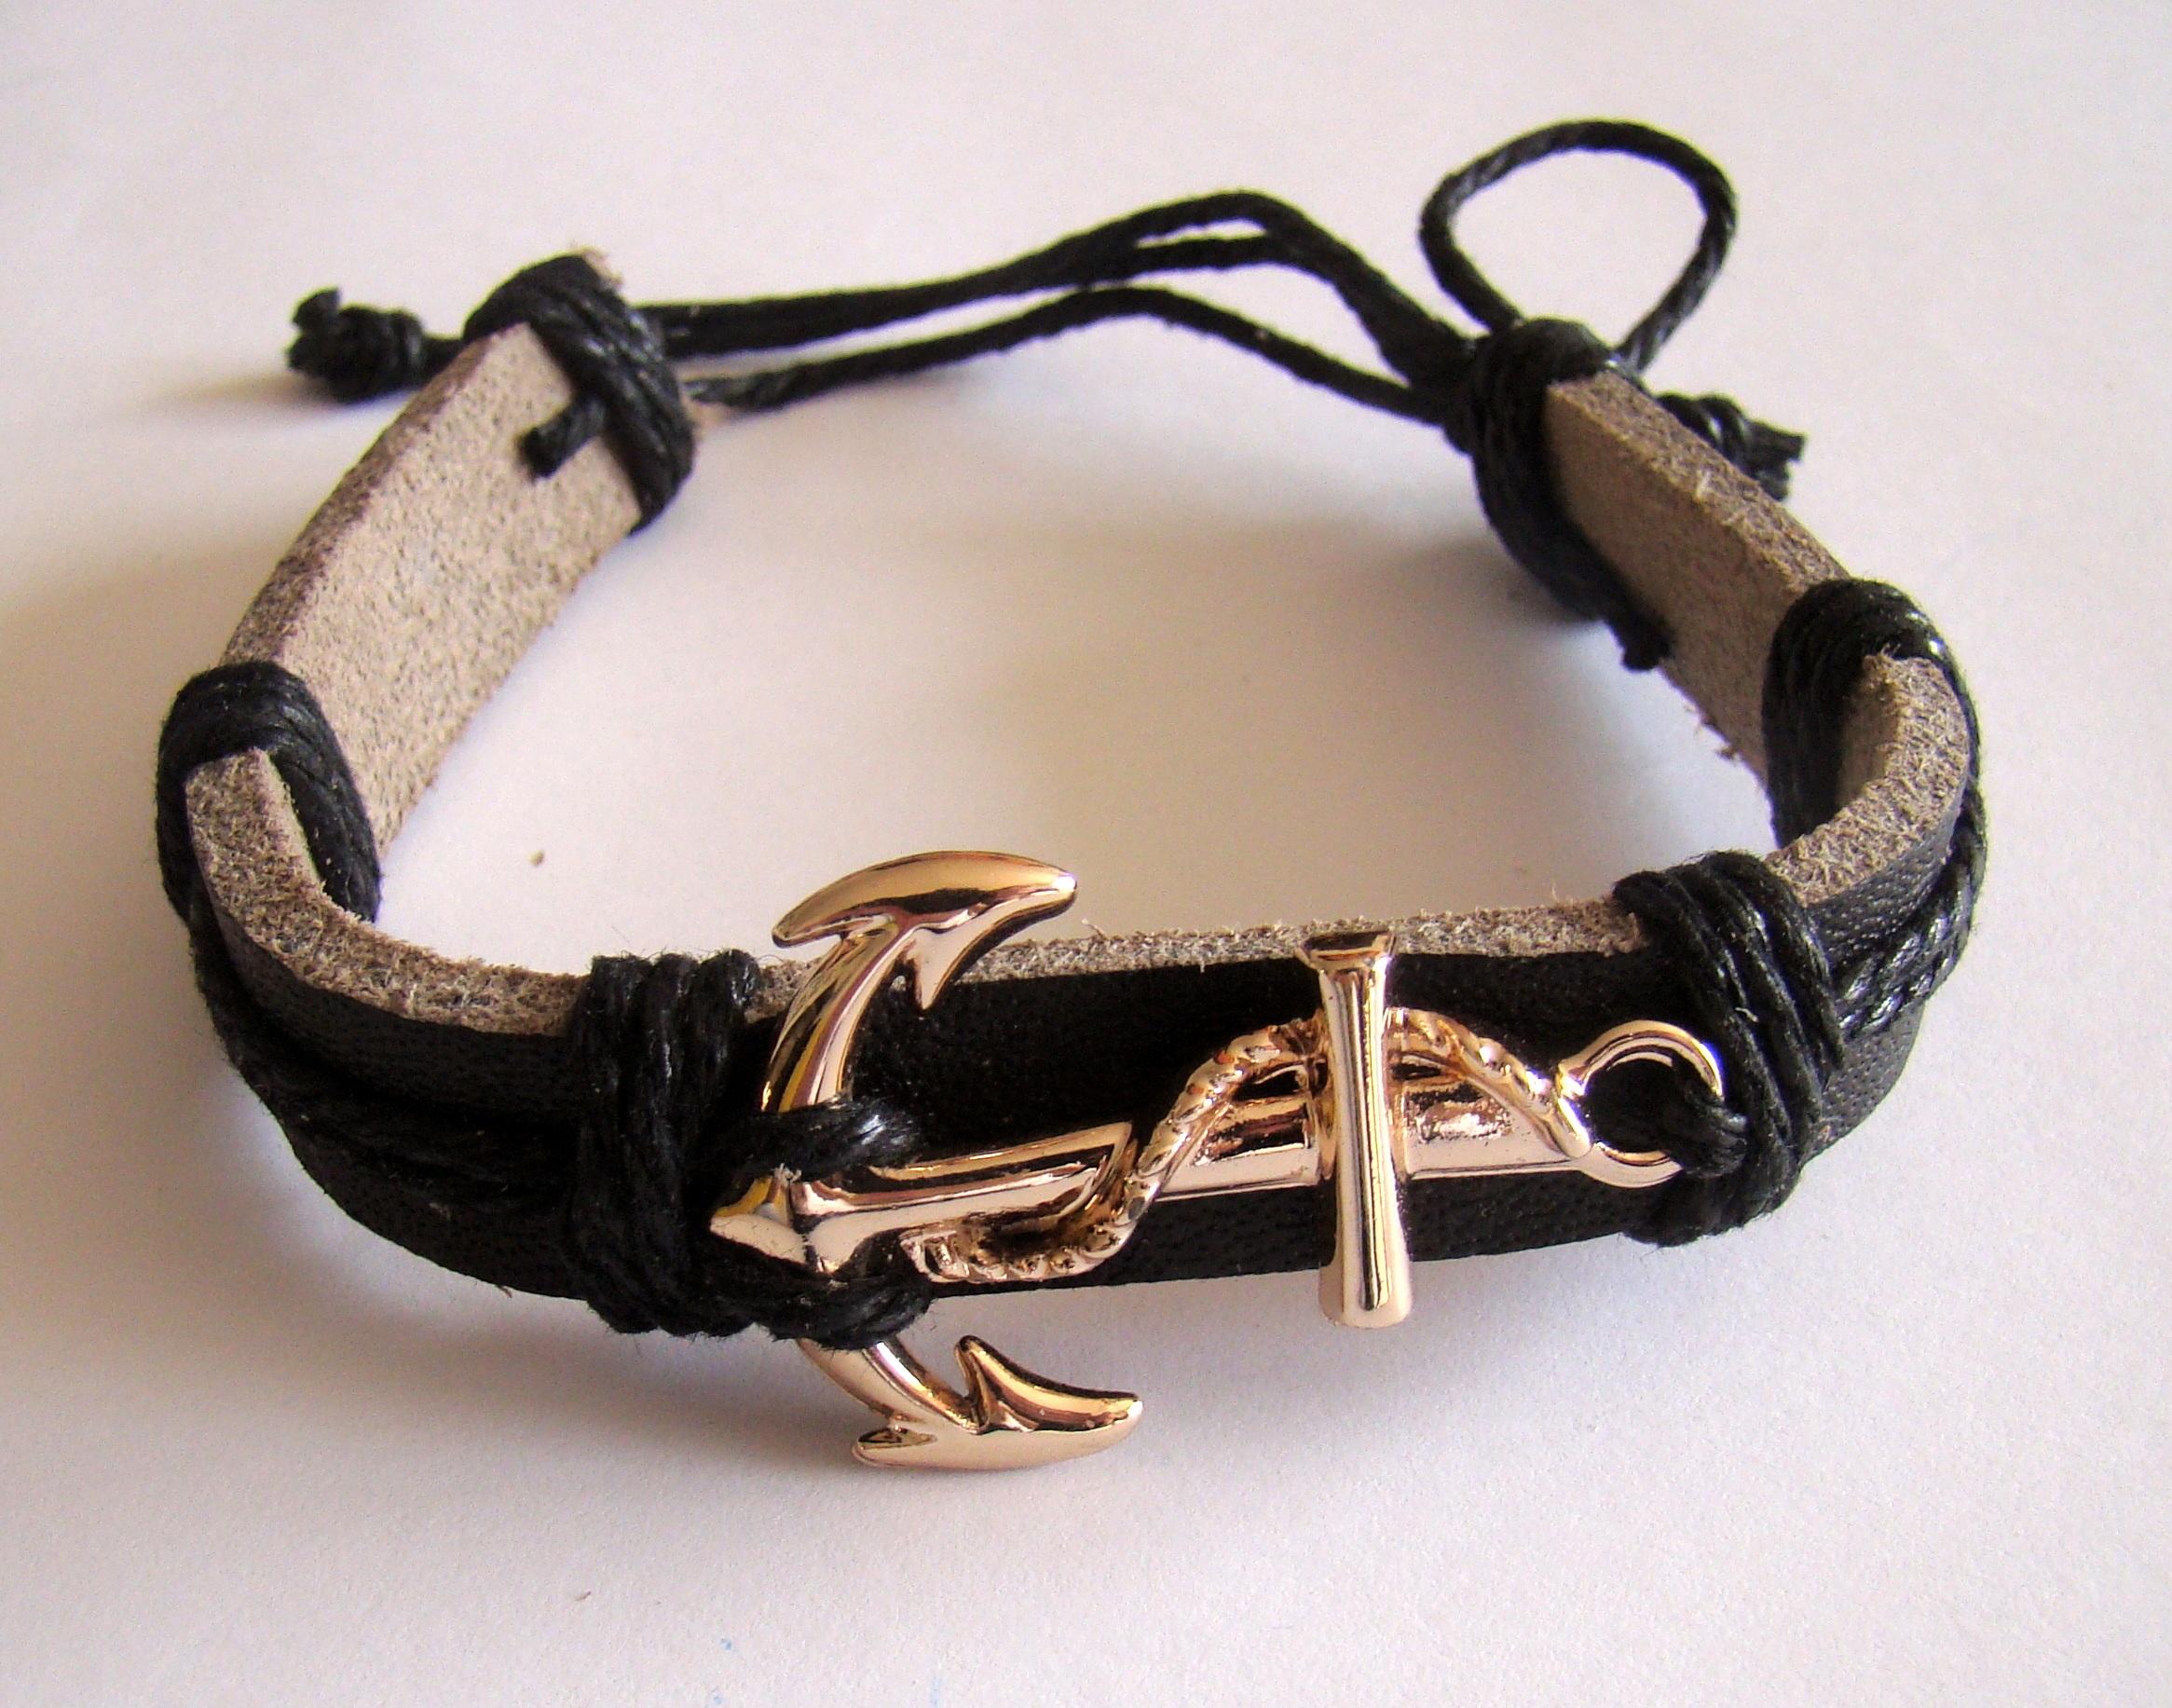 ae8c785acec9 mano mar cuero cadena collar pulsera joyería ancla Makammos Accesorio de  moda